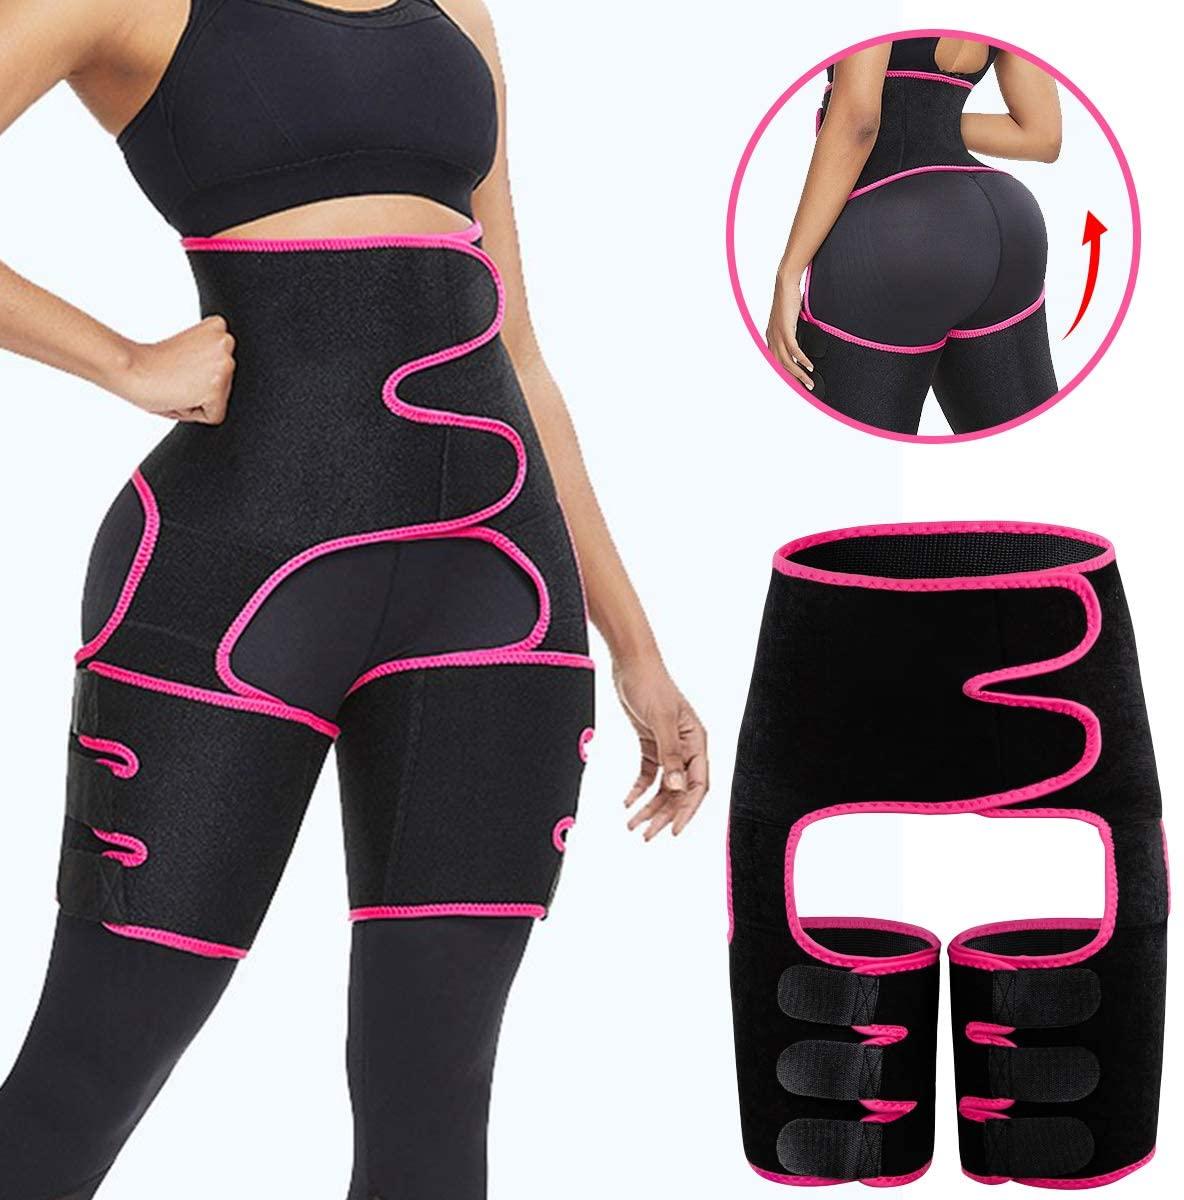 MEILYLA Waist Trainer 3-in-1 Thigh Trimmer for Women High Waist Body Shaper Sliming Support Belt Weight Butt Lifter for Sport Fitness Training Exercise